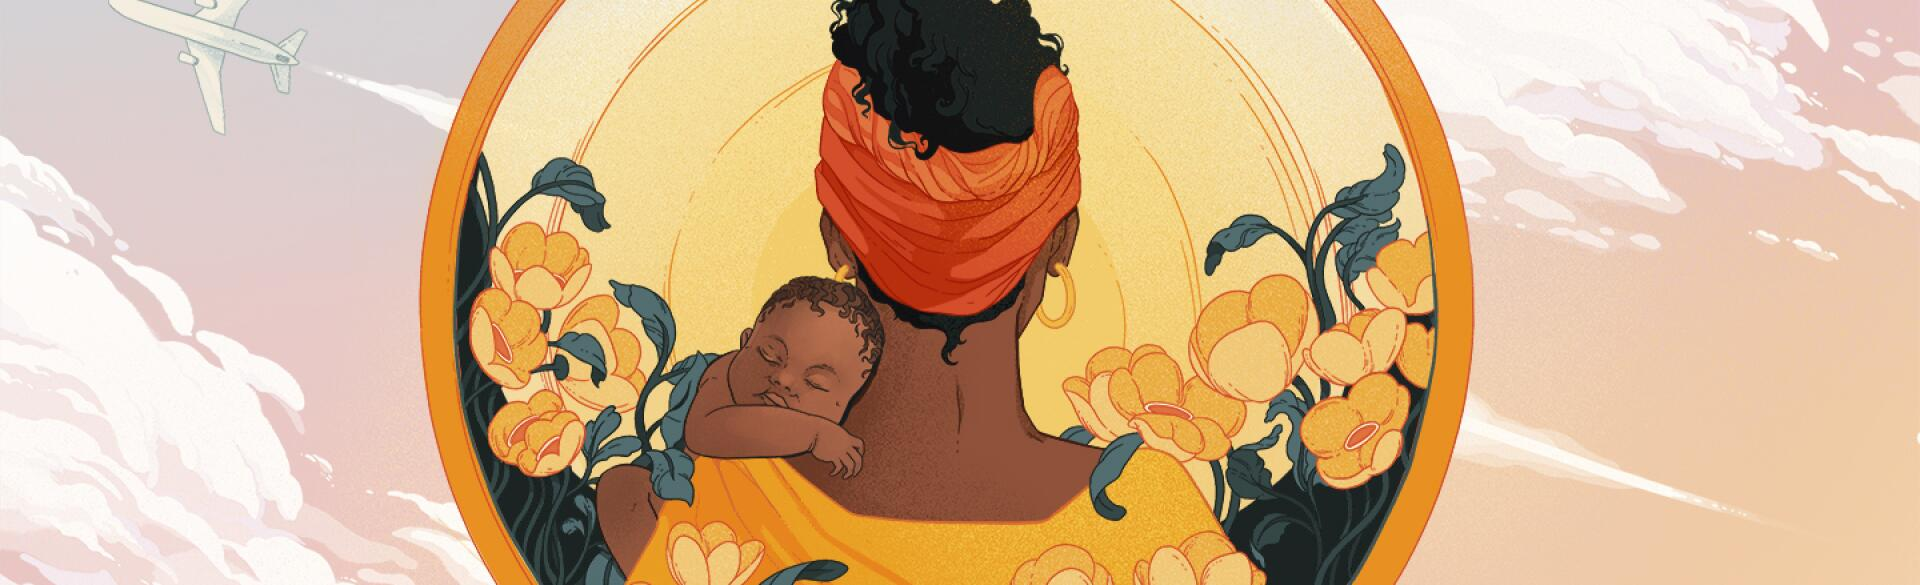 illustration_of_grandmother_holding_grandchild_by_dani_pendergast_1440x584.jpg